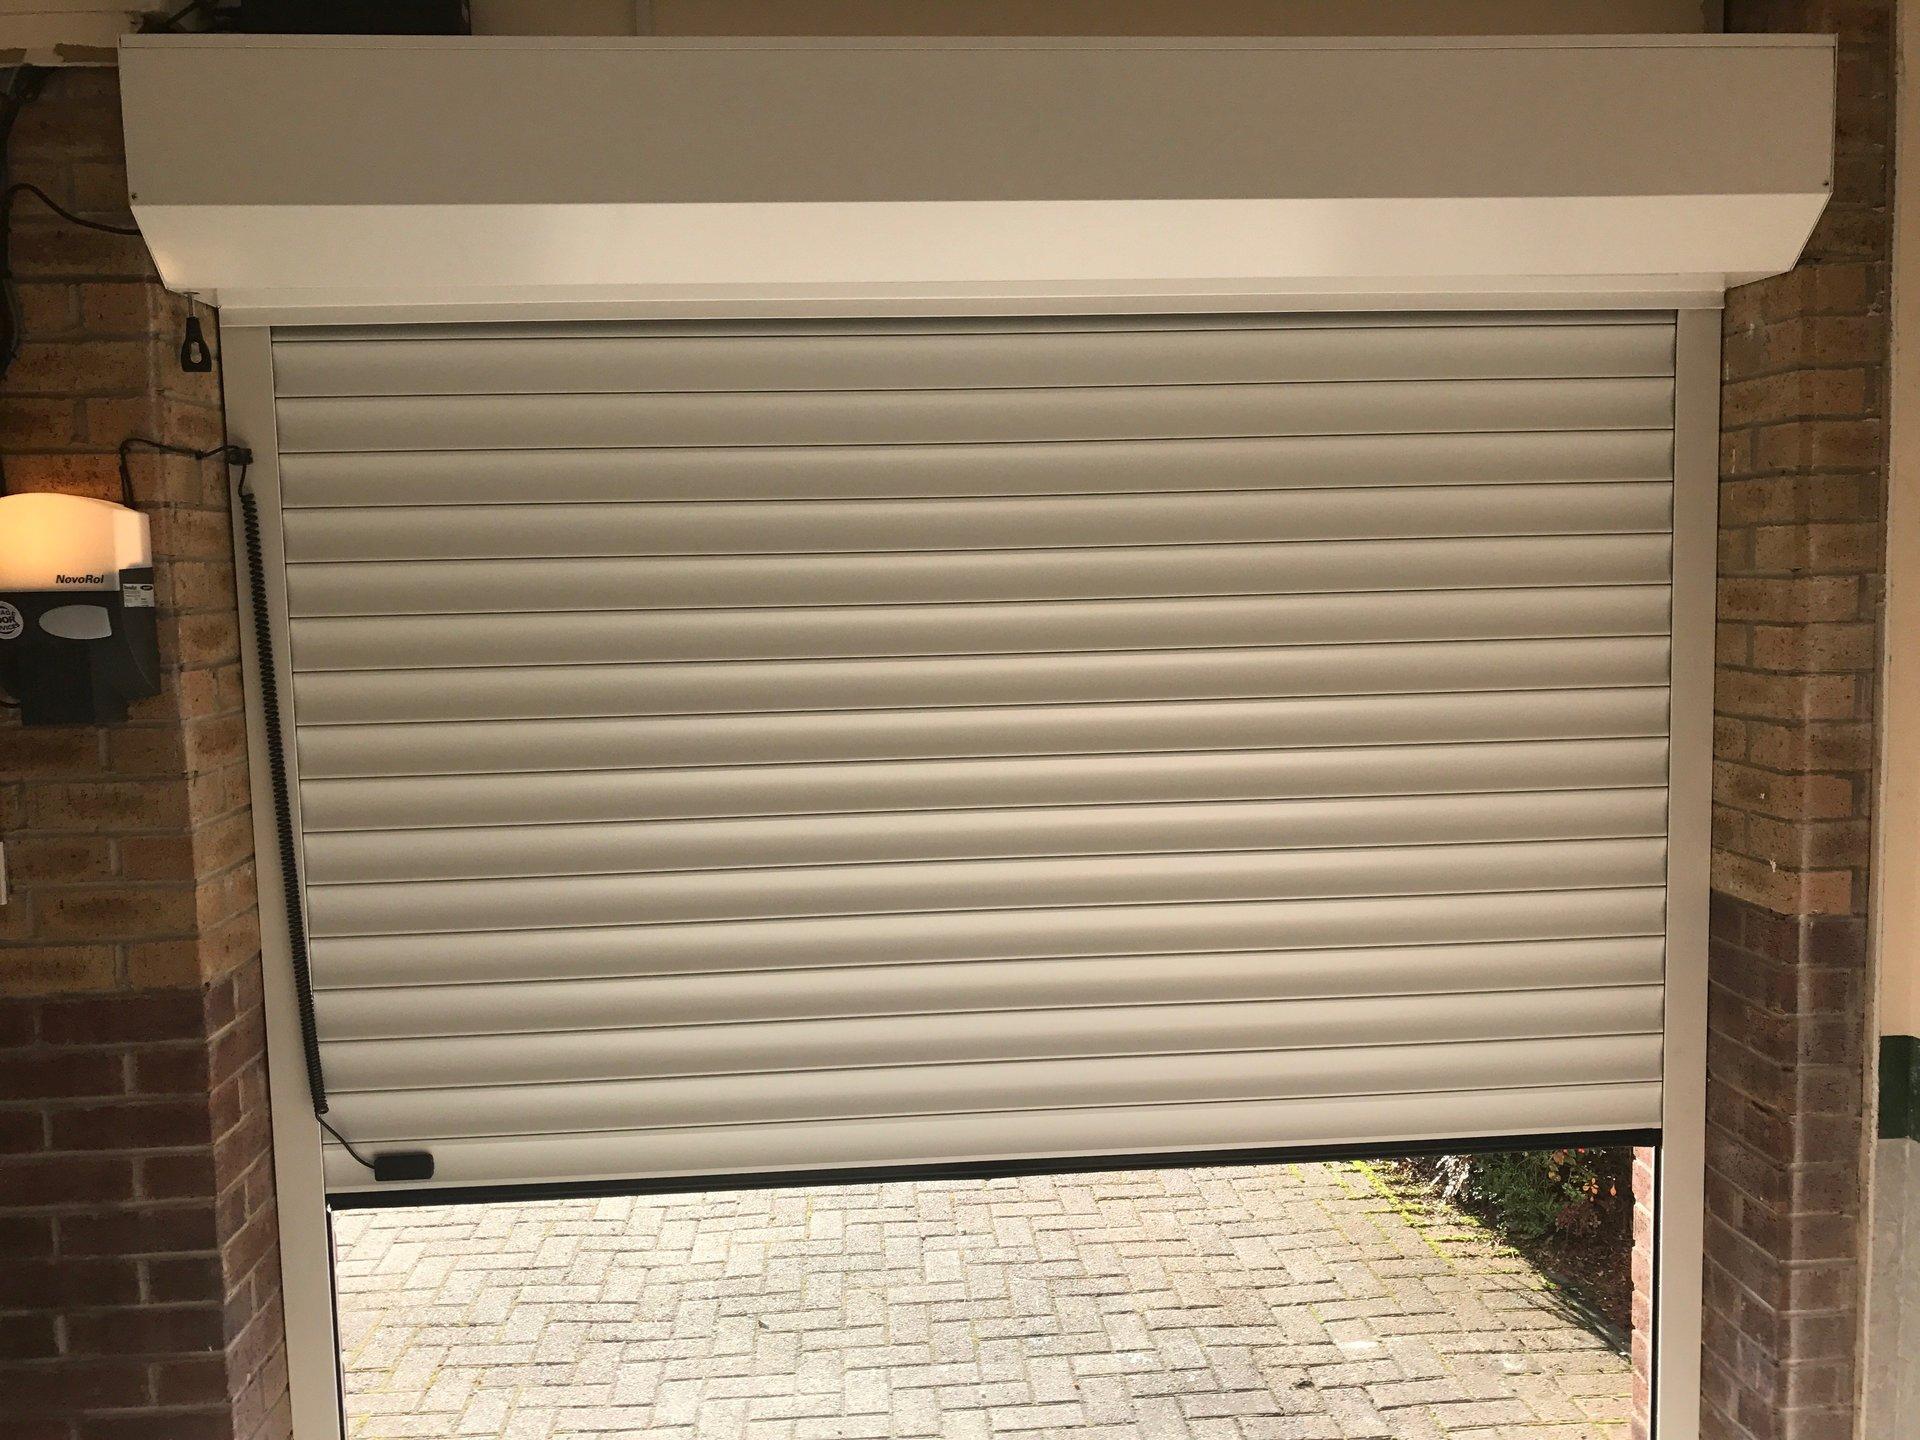 A white shutter